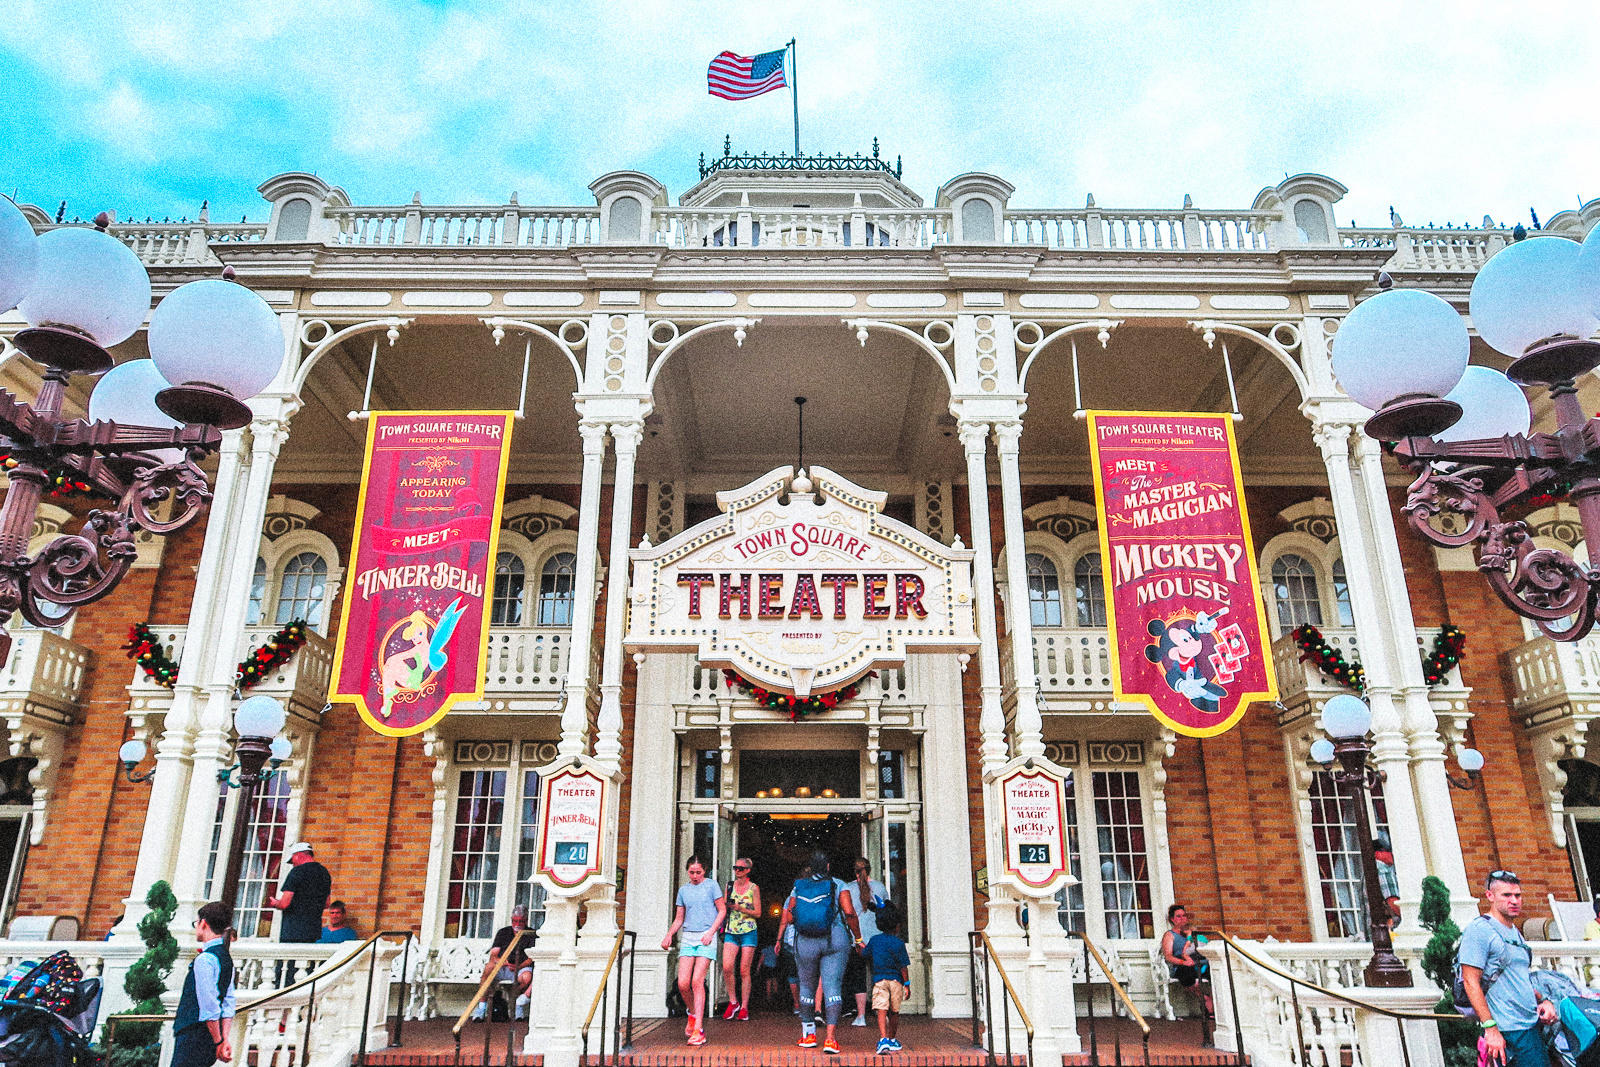 walt disney world magic kingdom town square theater